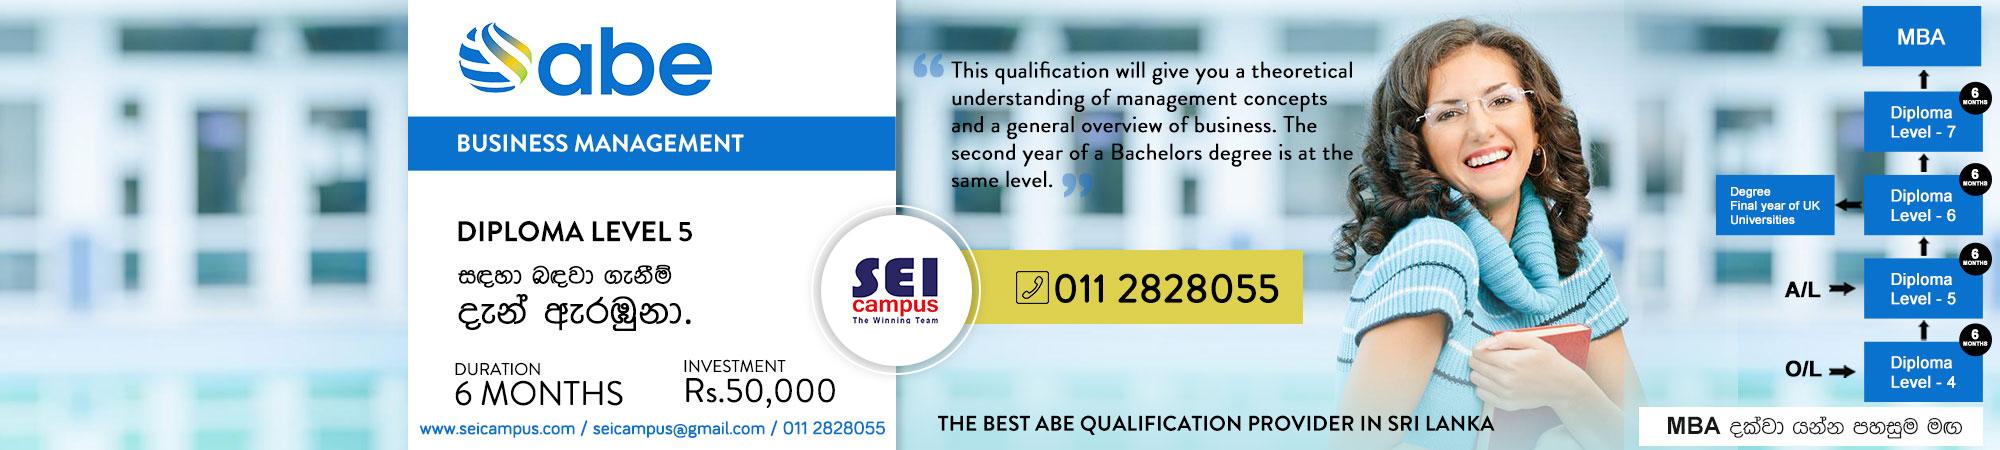 Apply ABE Level 5 at Sei Campus